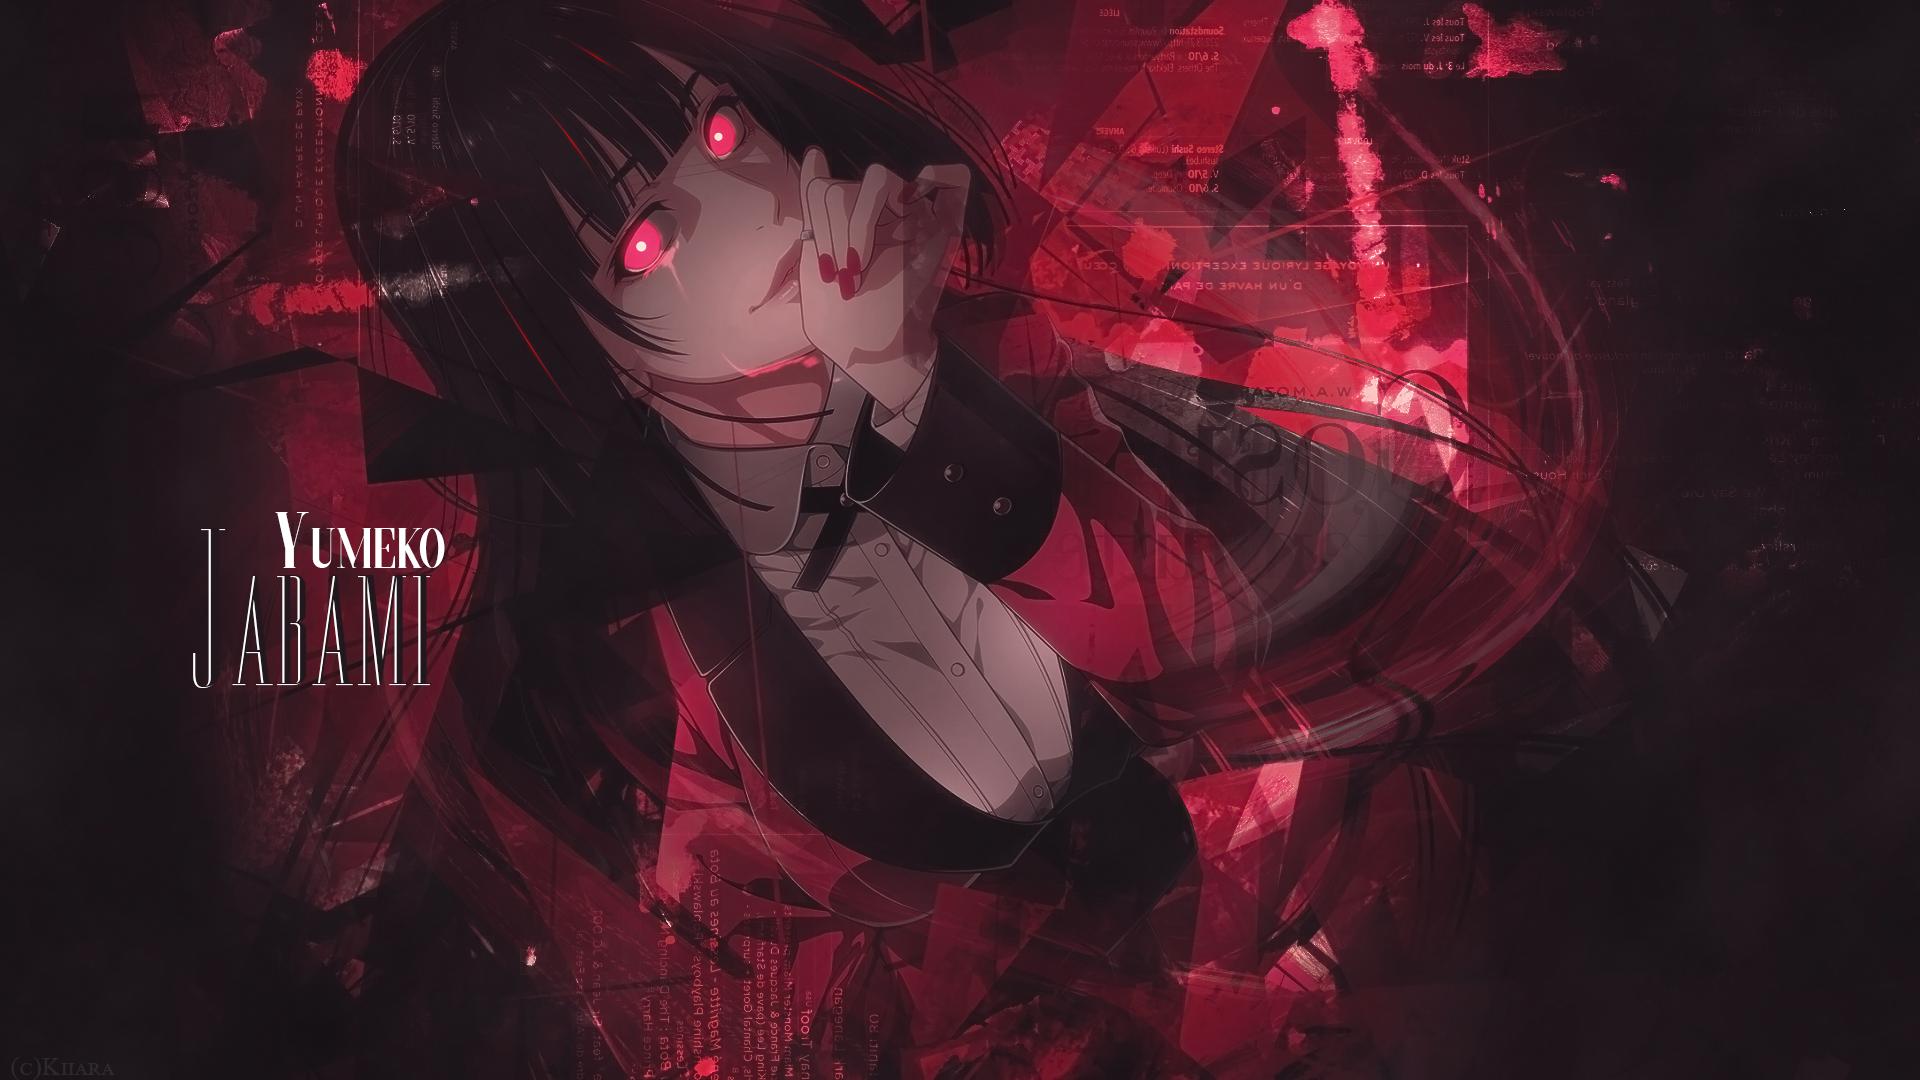 Kakegurui Anime Anime Wallpaper Aesthetic Anime